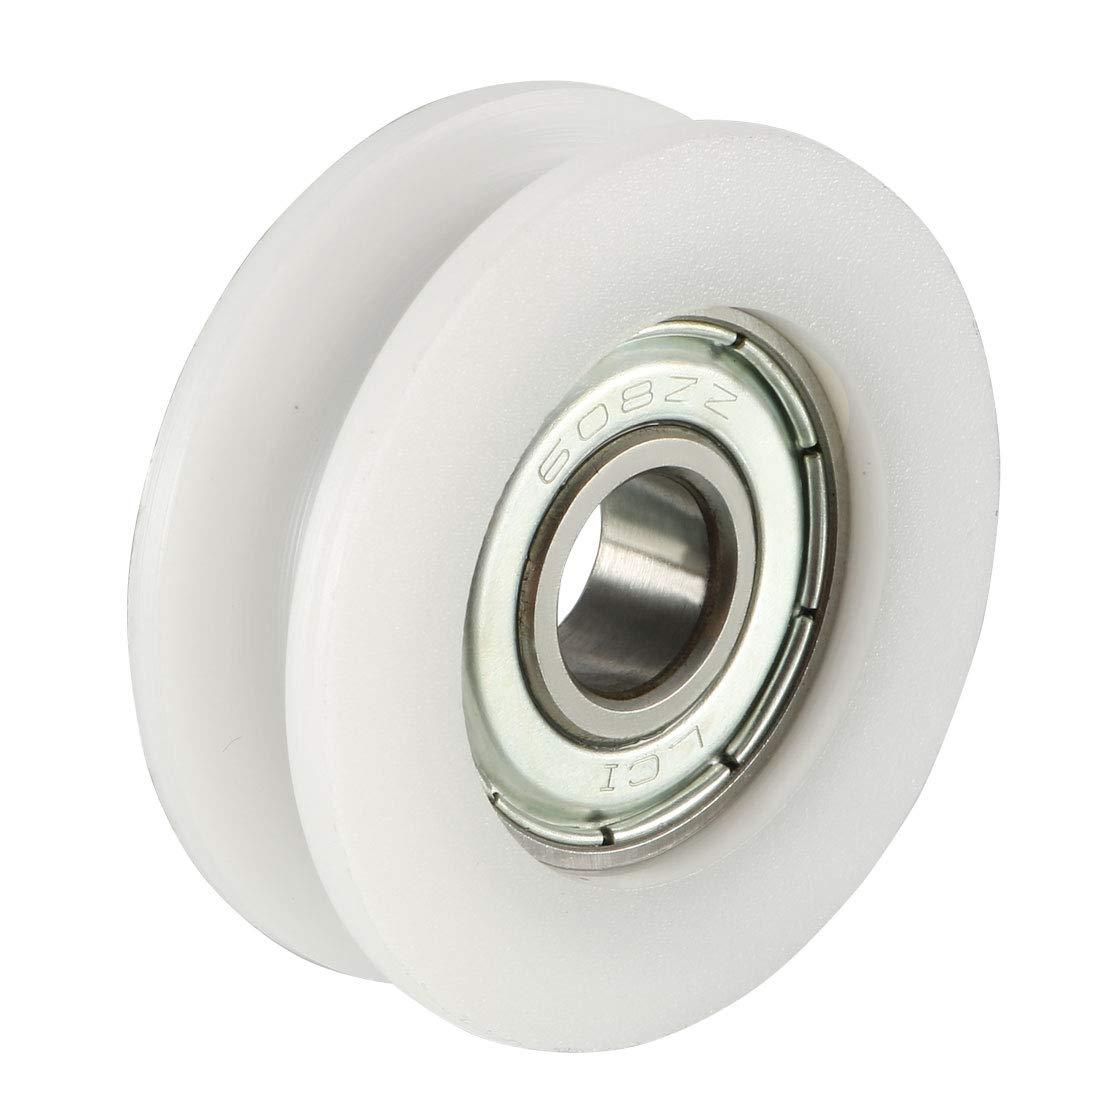 uxcell 2pcs 4.7mm Deep Metal V Groove Guide Bearing Pulley Rail Ball Wheel 8x50x12mm